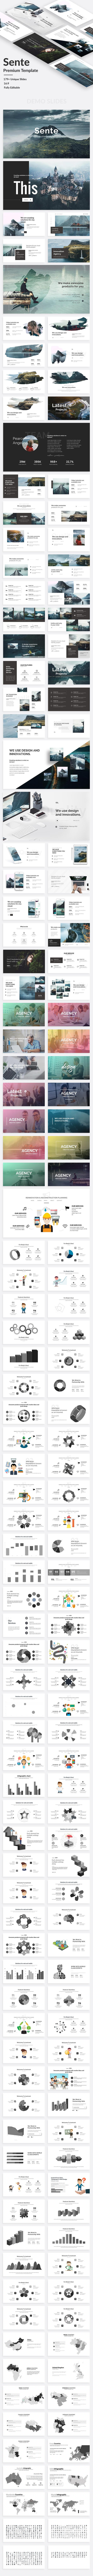 Sente Premium Design Google Slide Template - Google Slides Presentation Templates